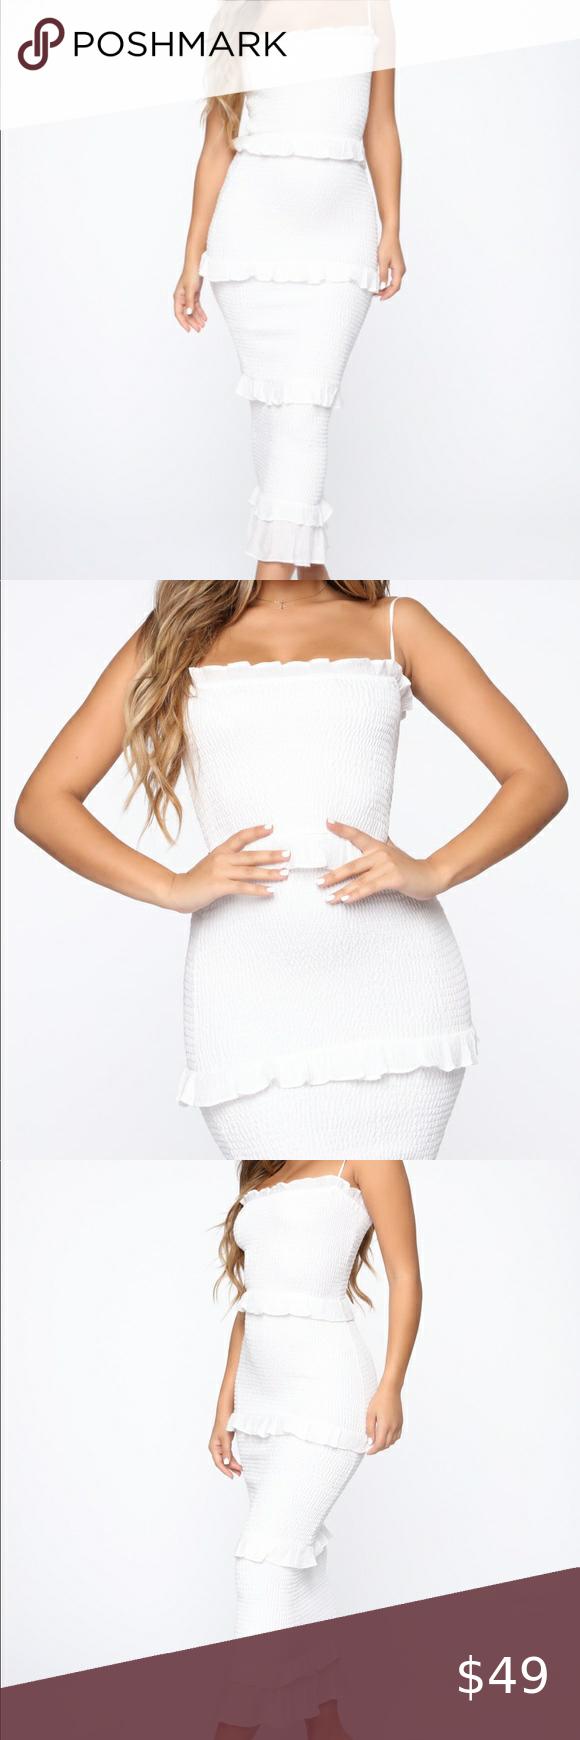 New Bodycon Ruffle Maxi Dress White Large Ruffled Maxi Dress Maxi Dress Fashion Nova Dress [ 1740 x 580 Pixel ]